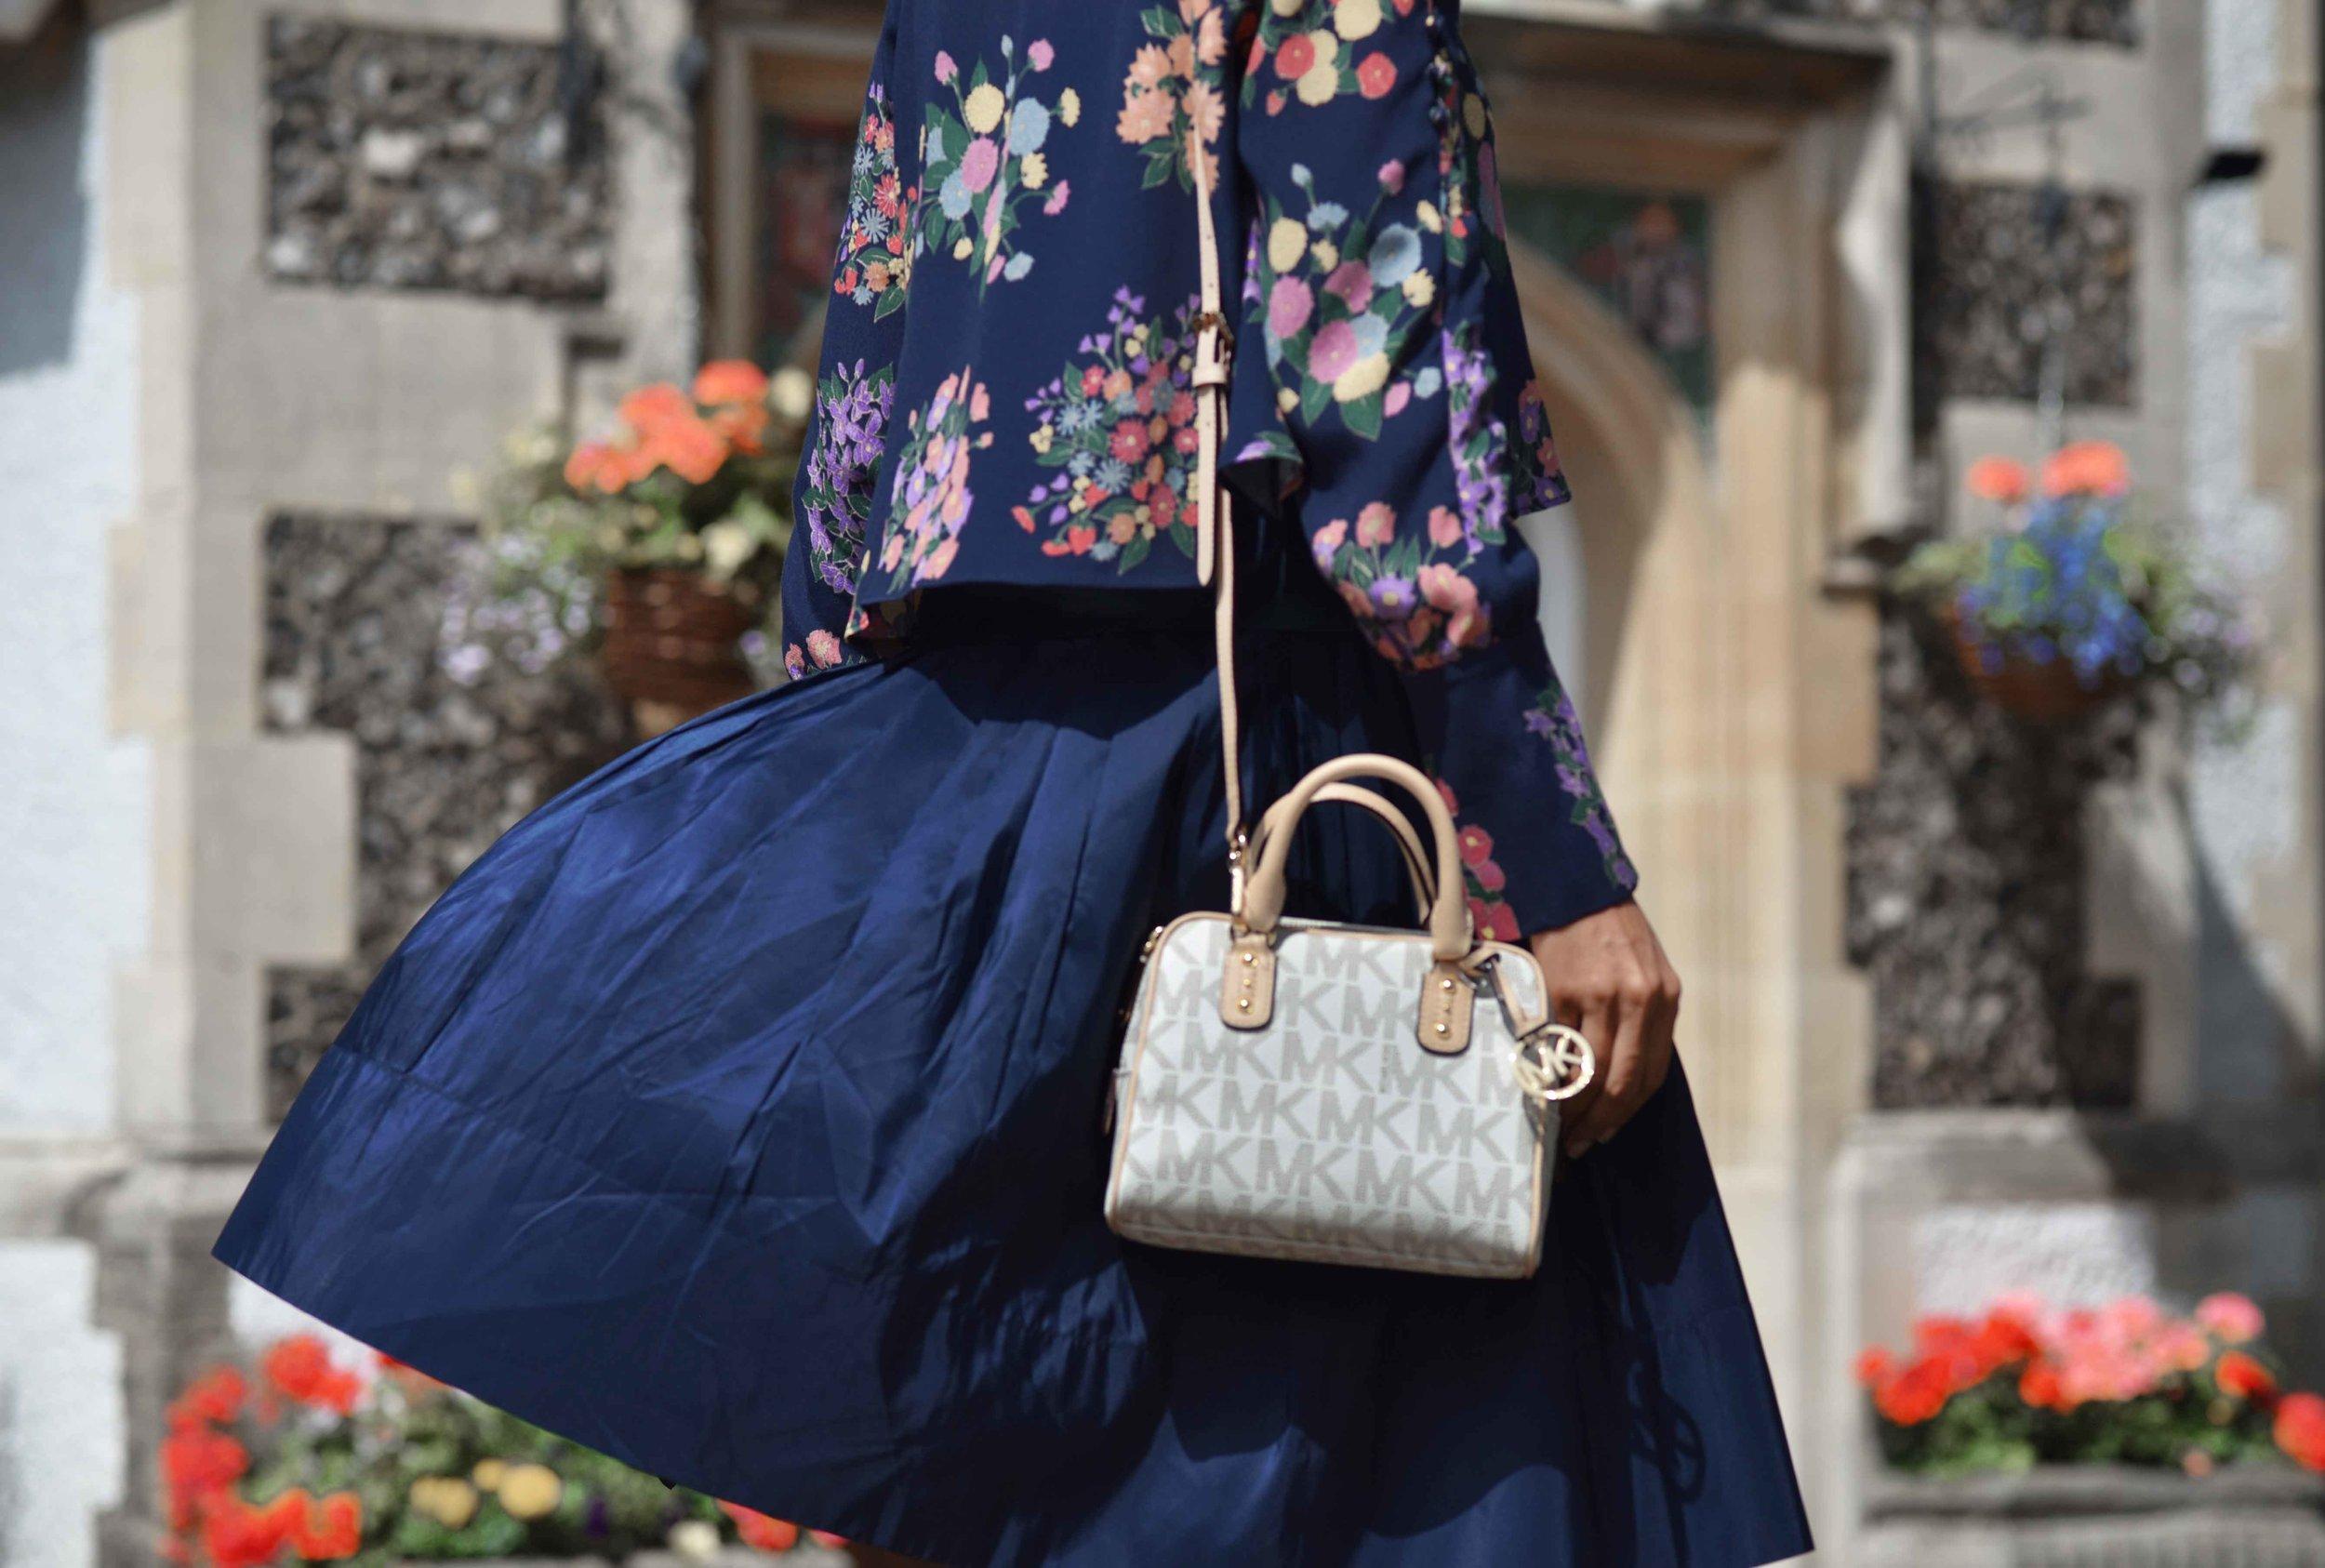 Zara floral top, Talbots silk Taffeta skirt, Michael Kors bag. Image©sourcingstyle.com